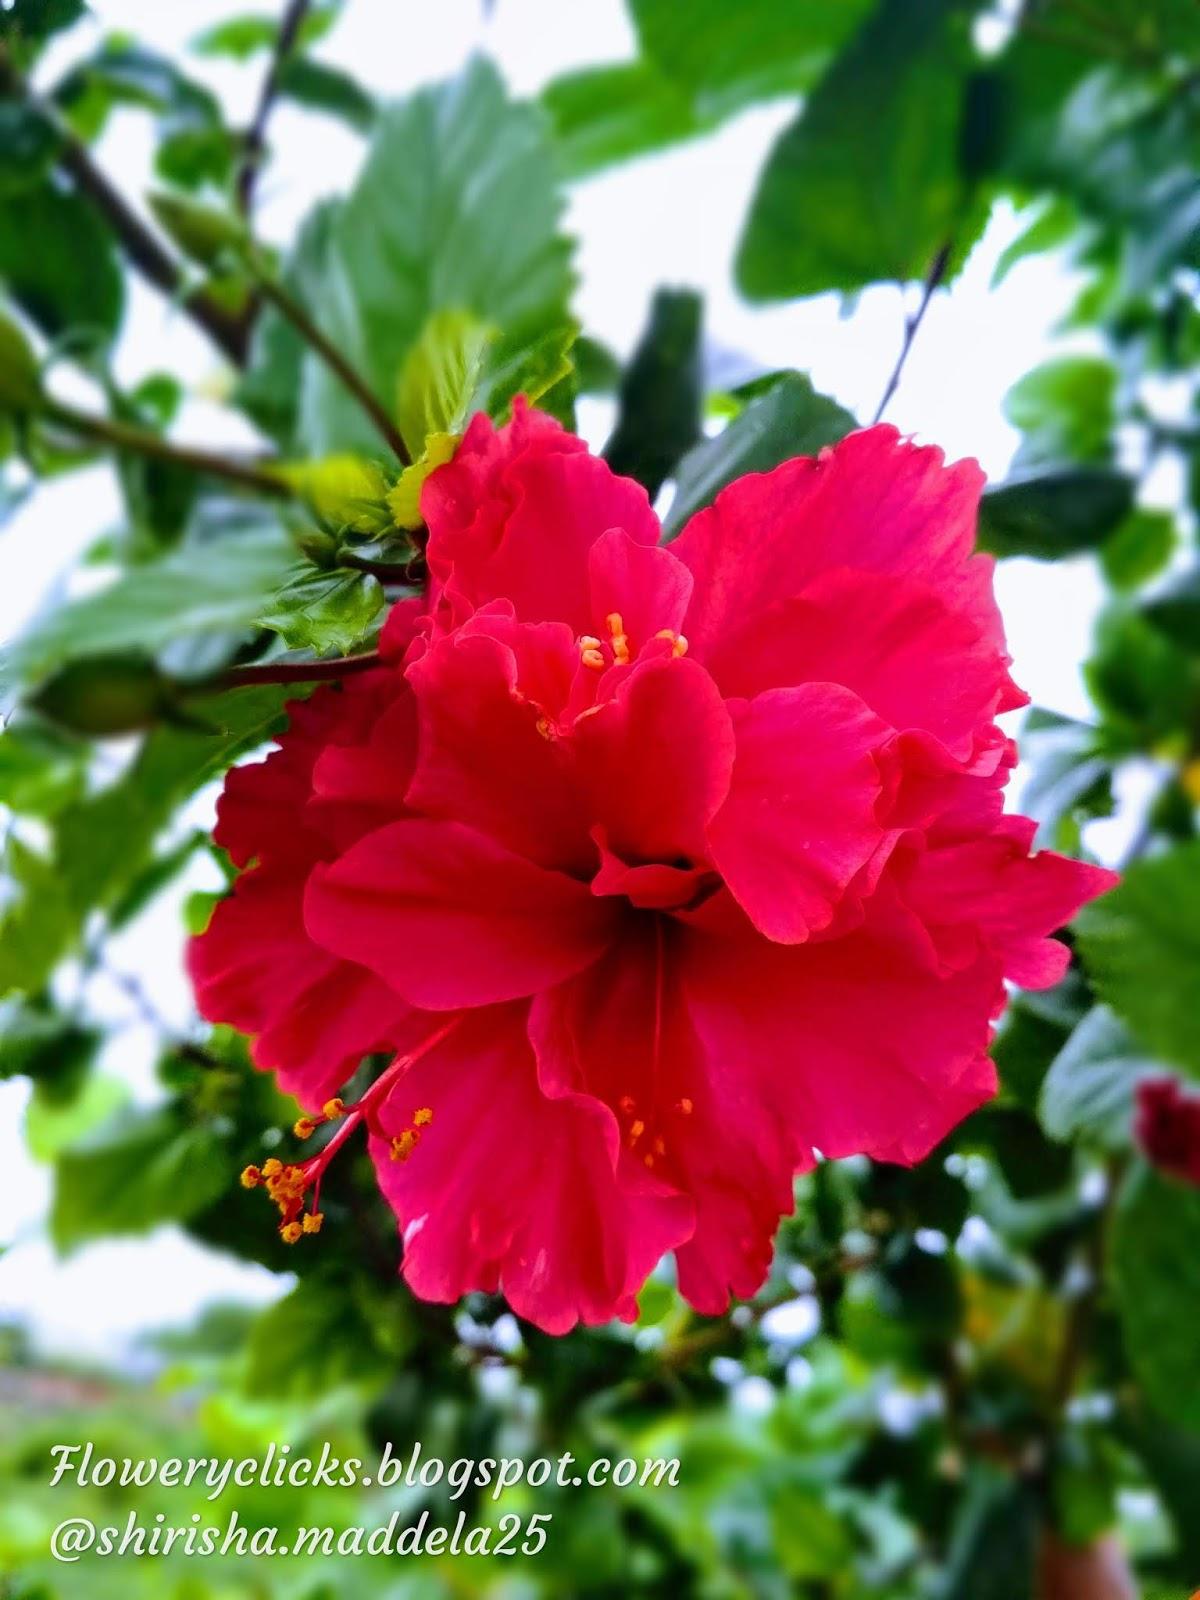 Mandara Flowerhibiscus Flower మదర